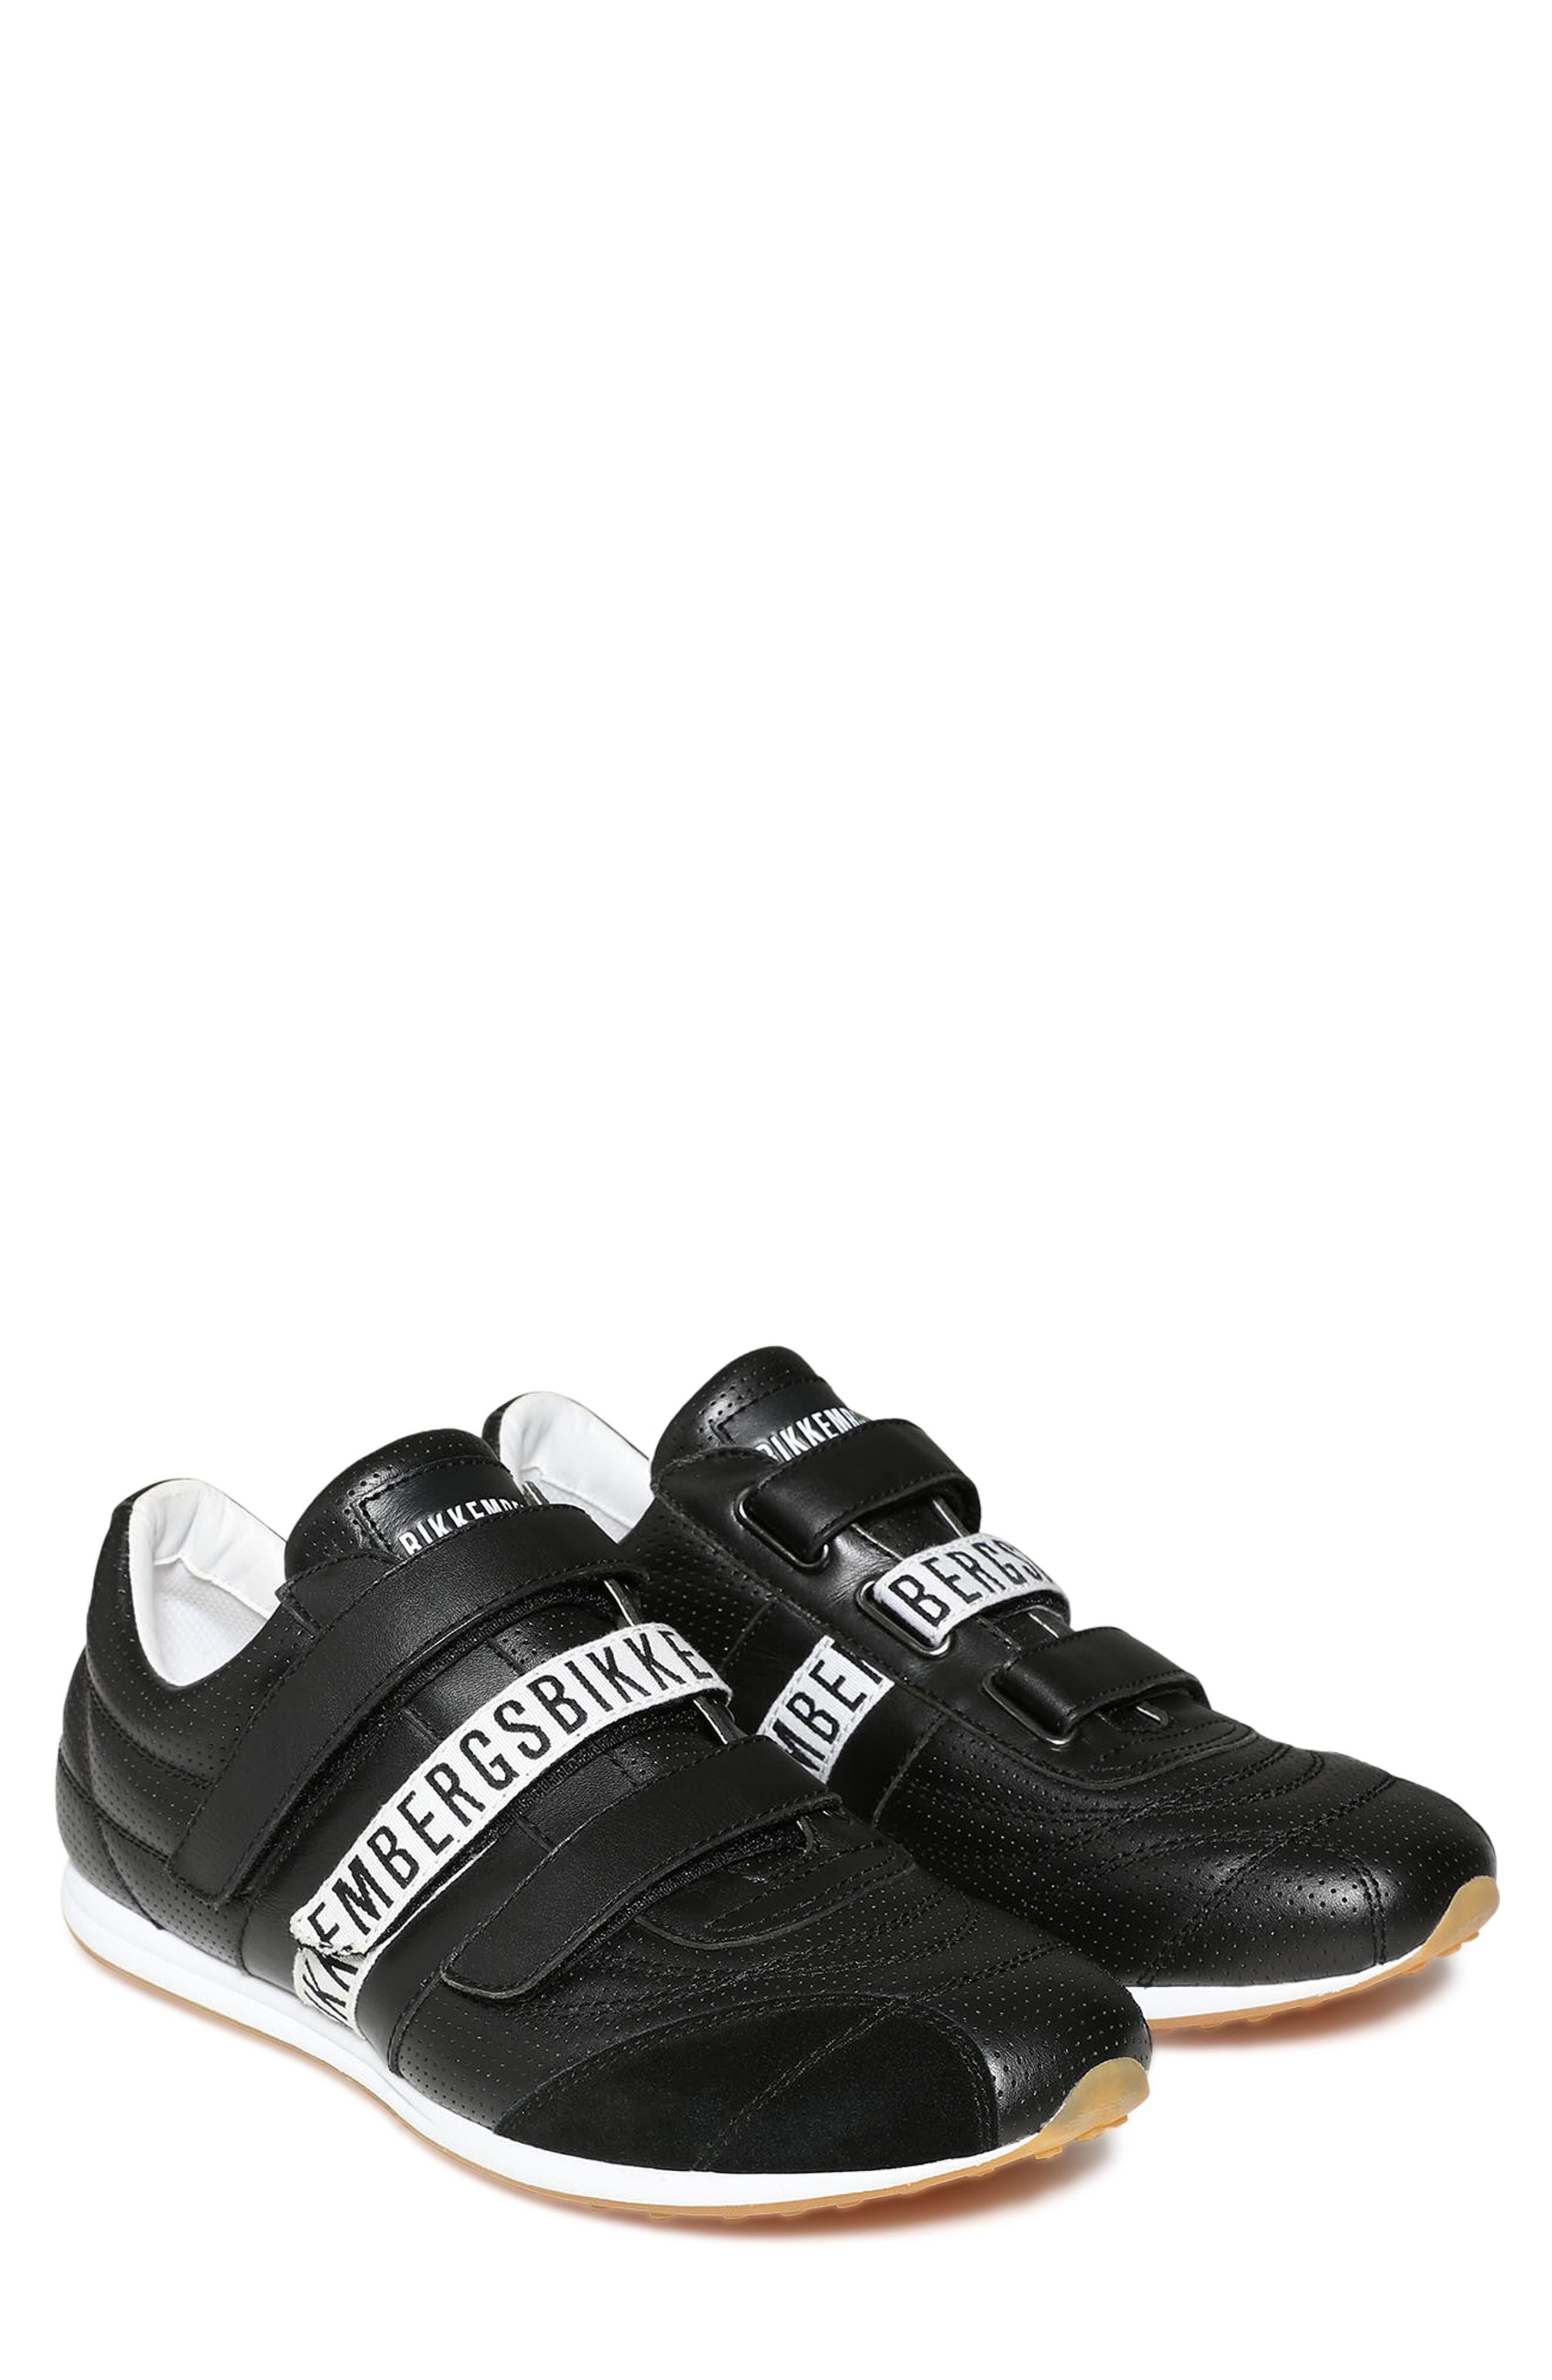 Bannon Sneaker